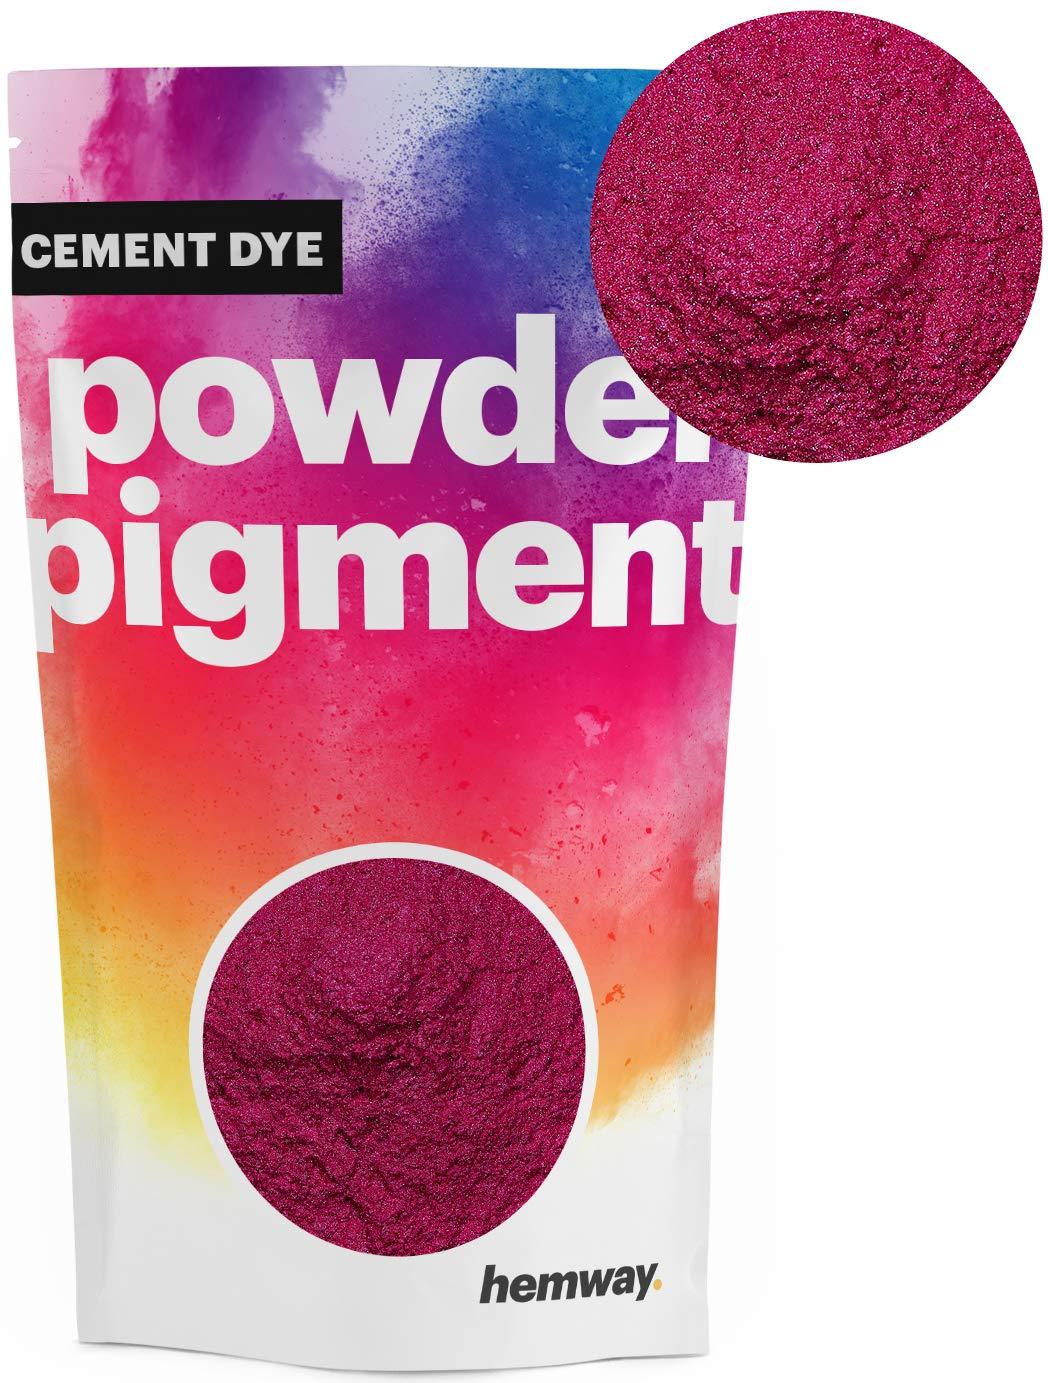 Hemway Cement Dye Powder Pigment Concrete Color Render Mortar Pointing Powdered Brick Toner Plaster (100g / 3.5oz, Metallic Cerise Pink)